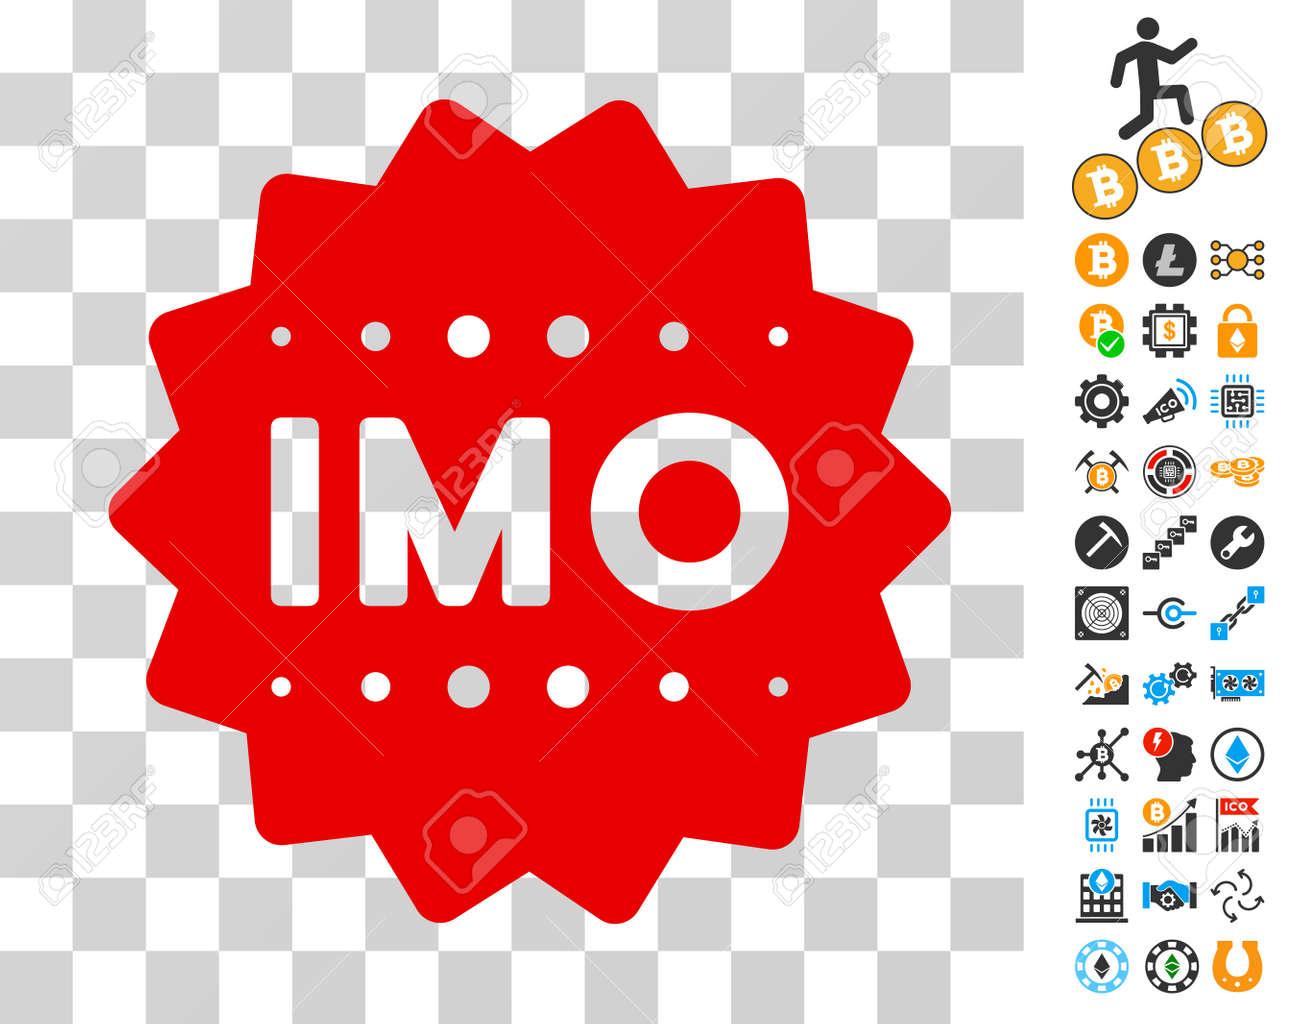 Imo Token Icon With Bonus Bitcoin Mining And Blockchain Pictograms